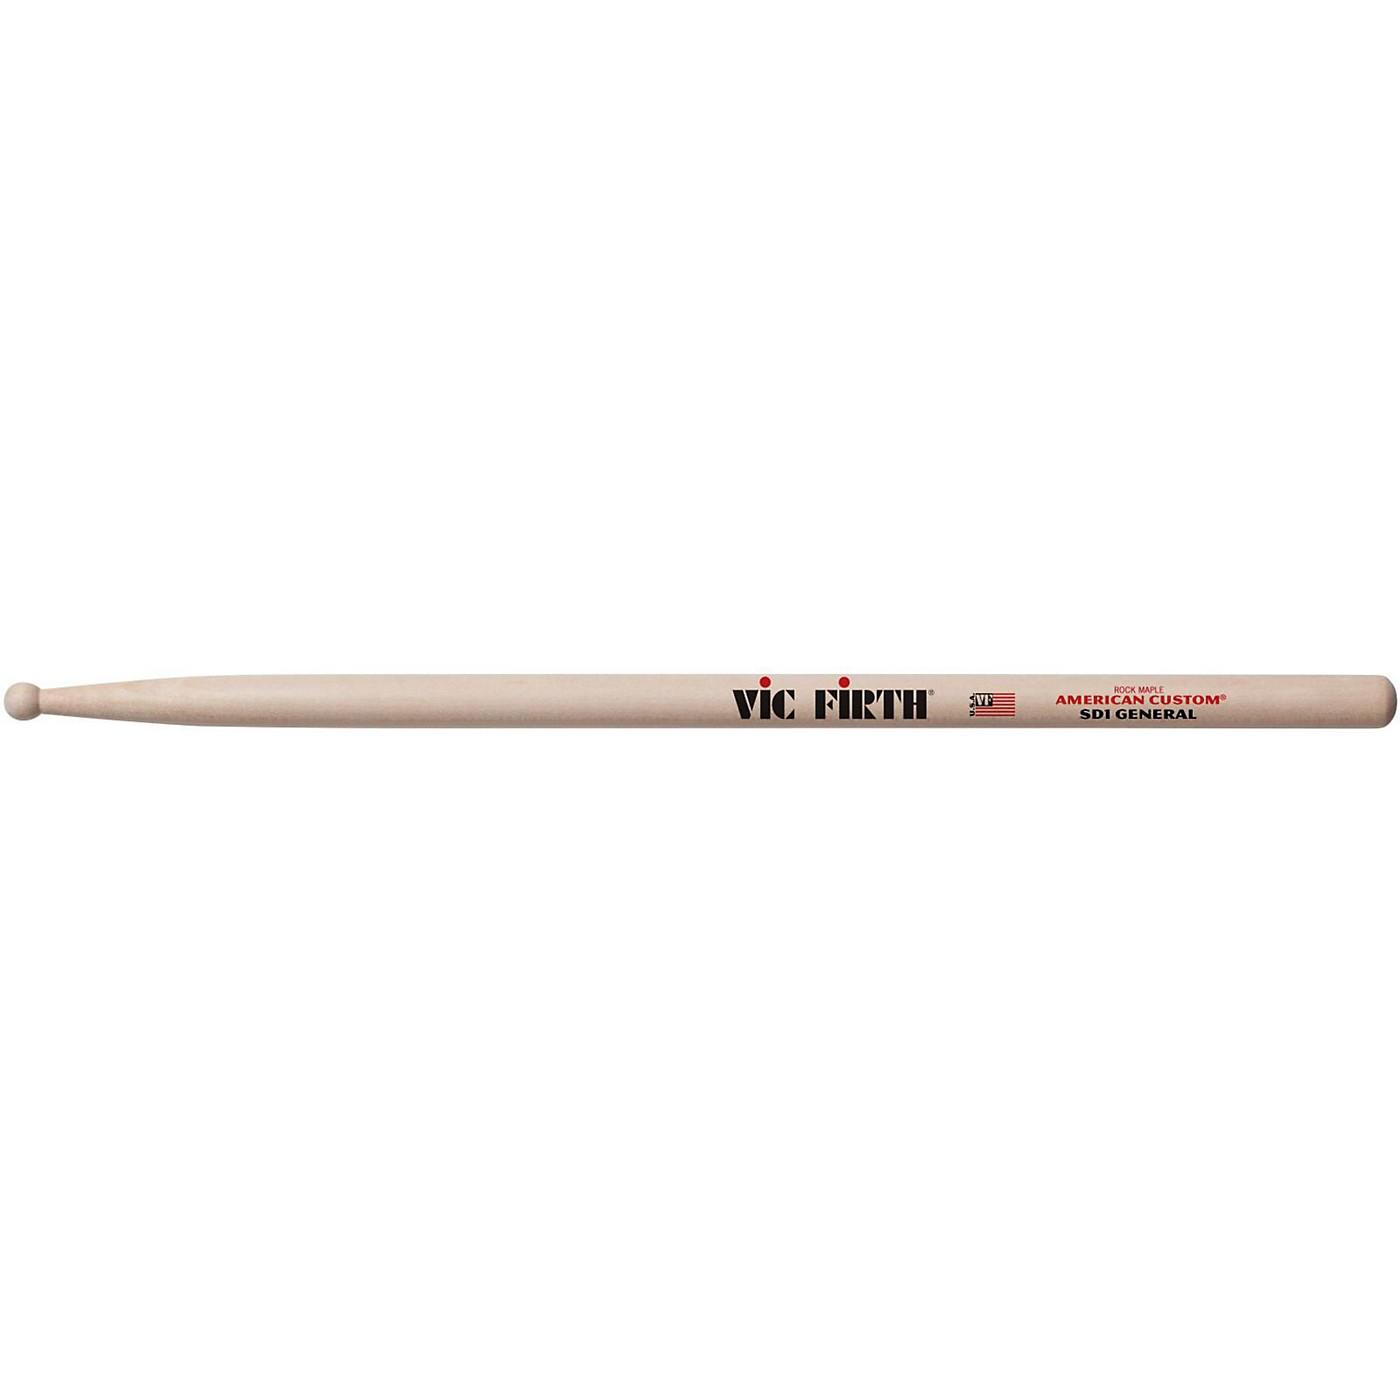 Vic Firth American Custom SD1 General Drum Sticks thumbnail